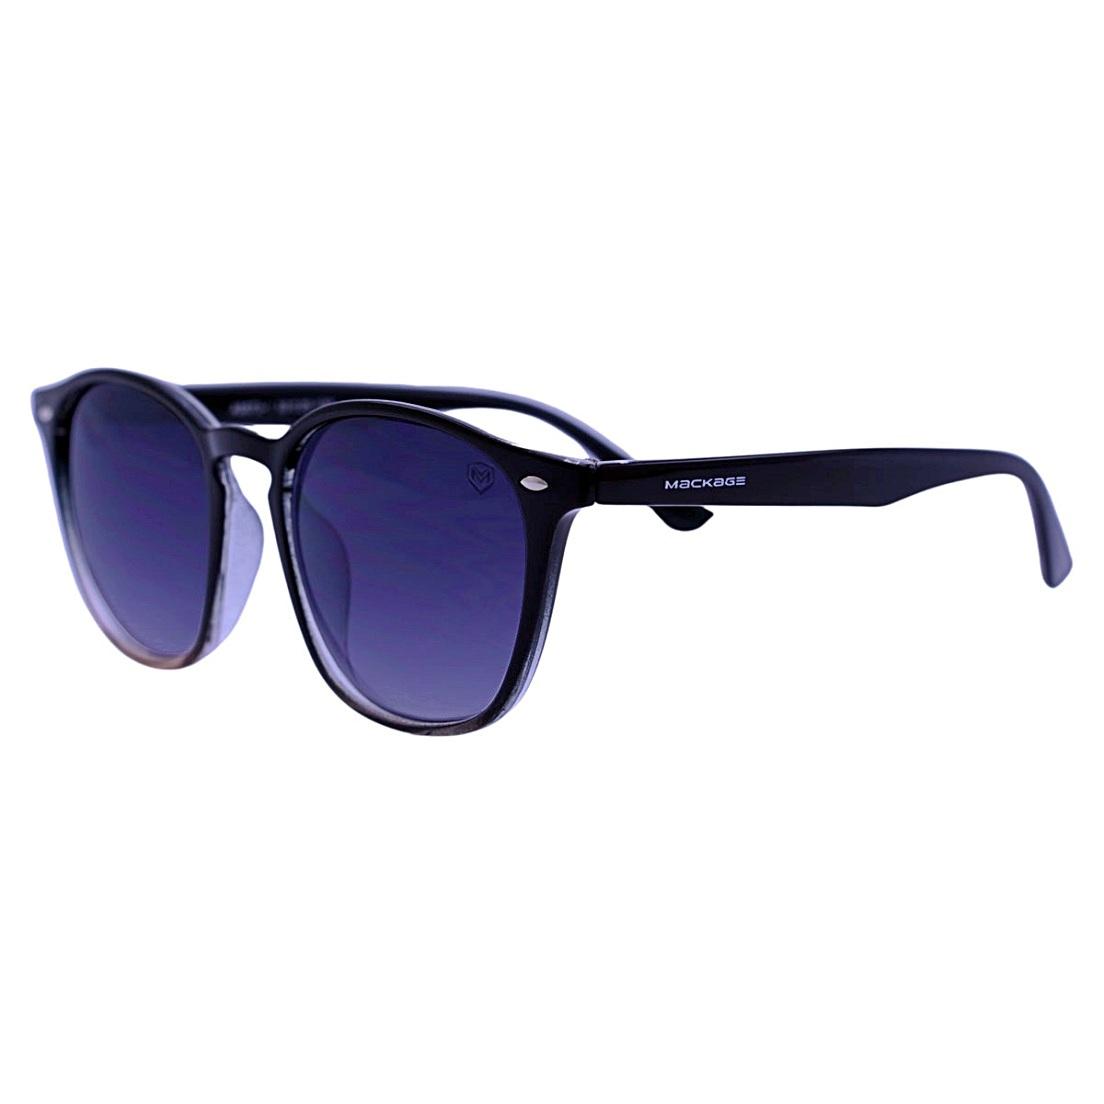 Óculos De Sol Mackage Unissex Acetato Quadrado Wayfarer